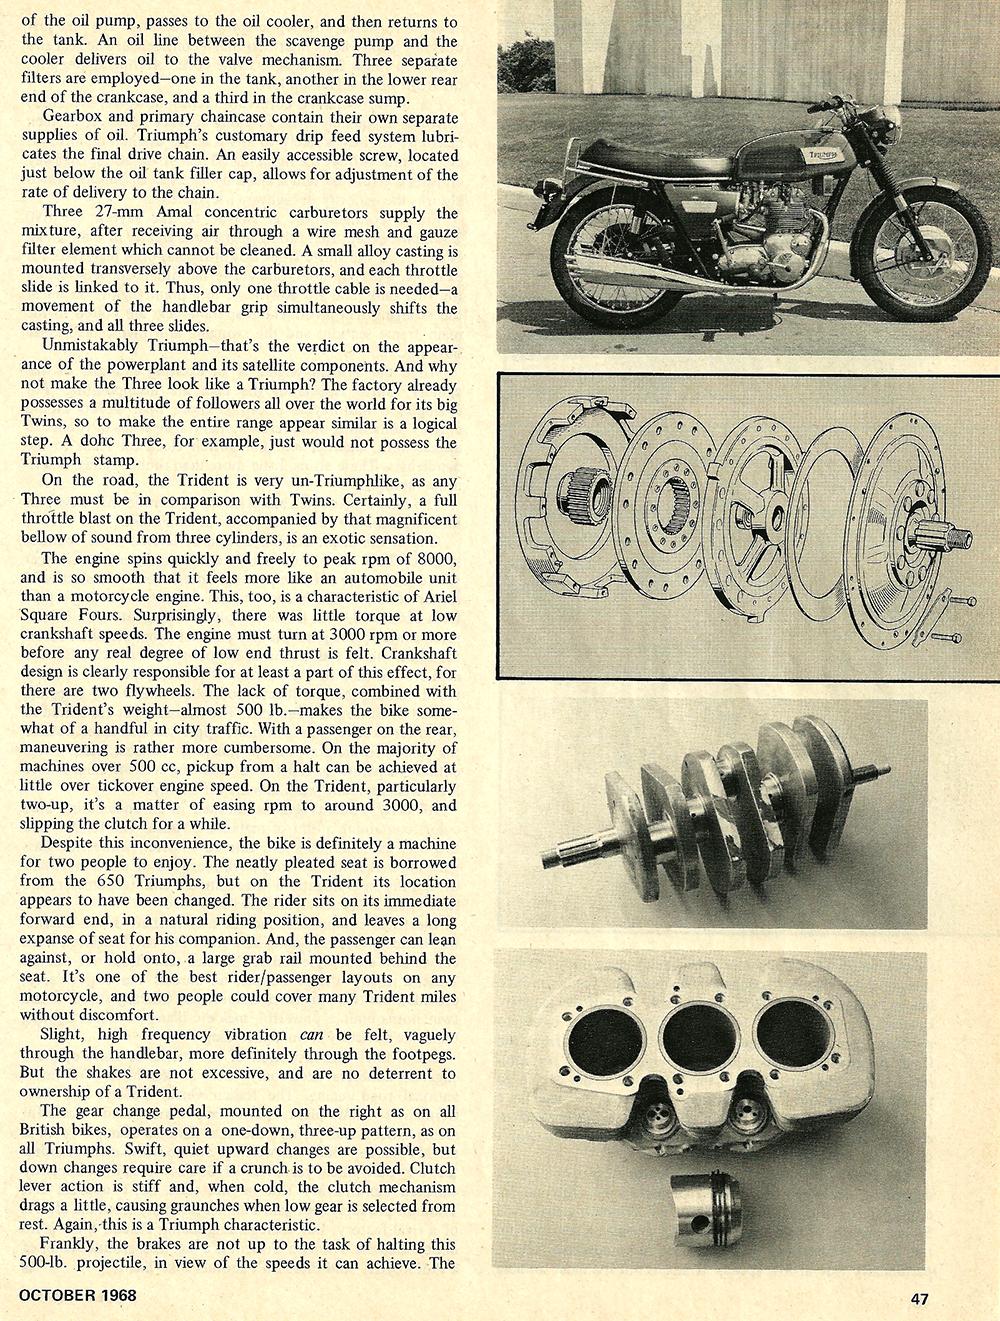 1968 Triumph Trident 750 road test 04.jpg